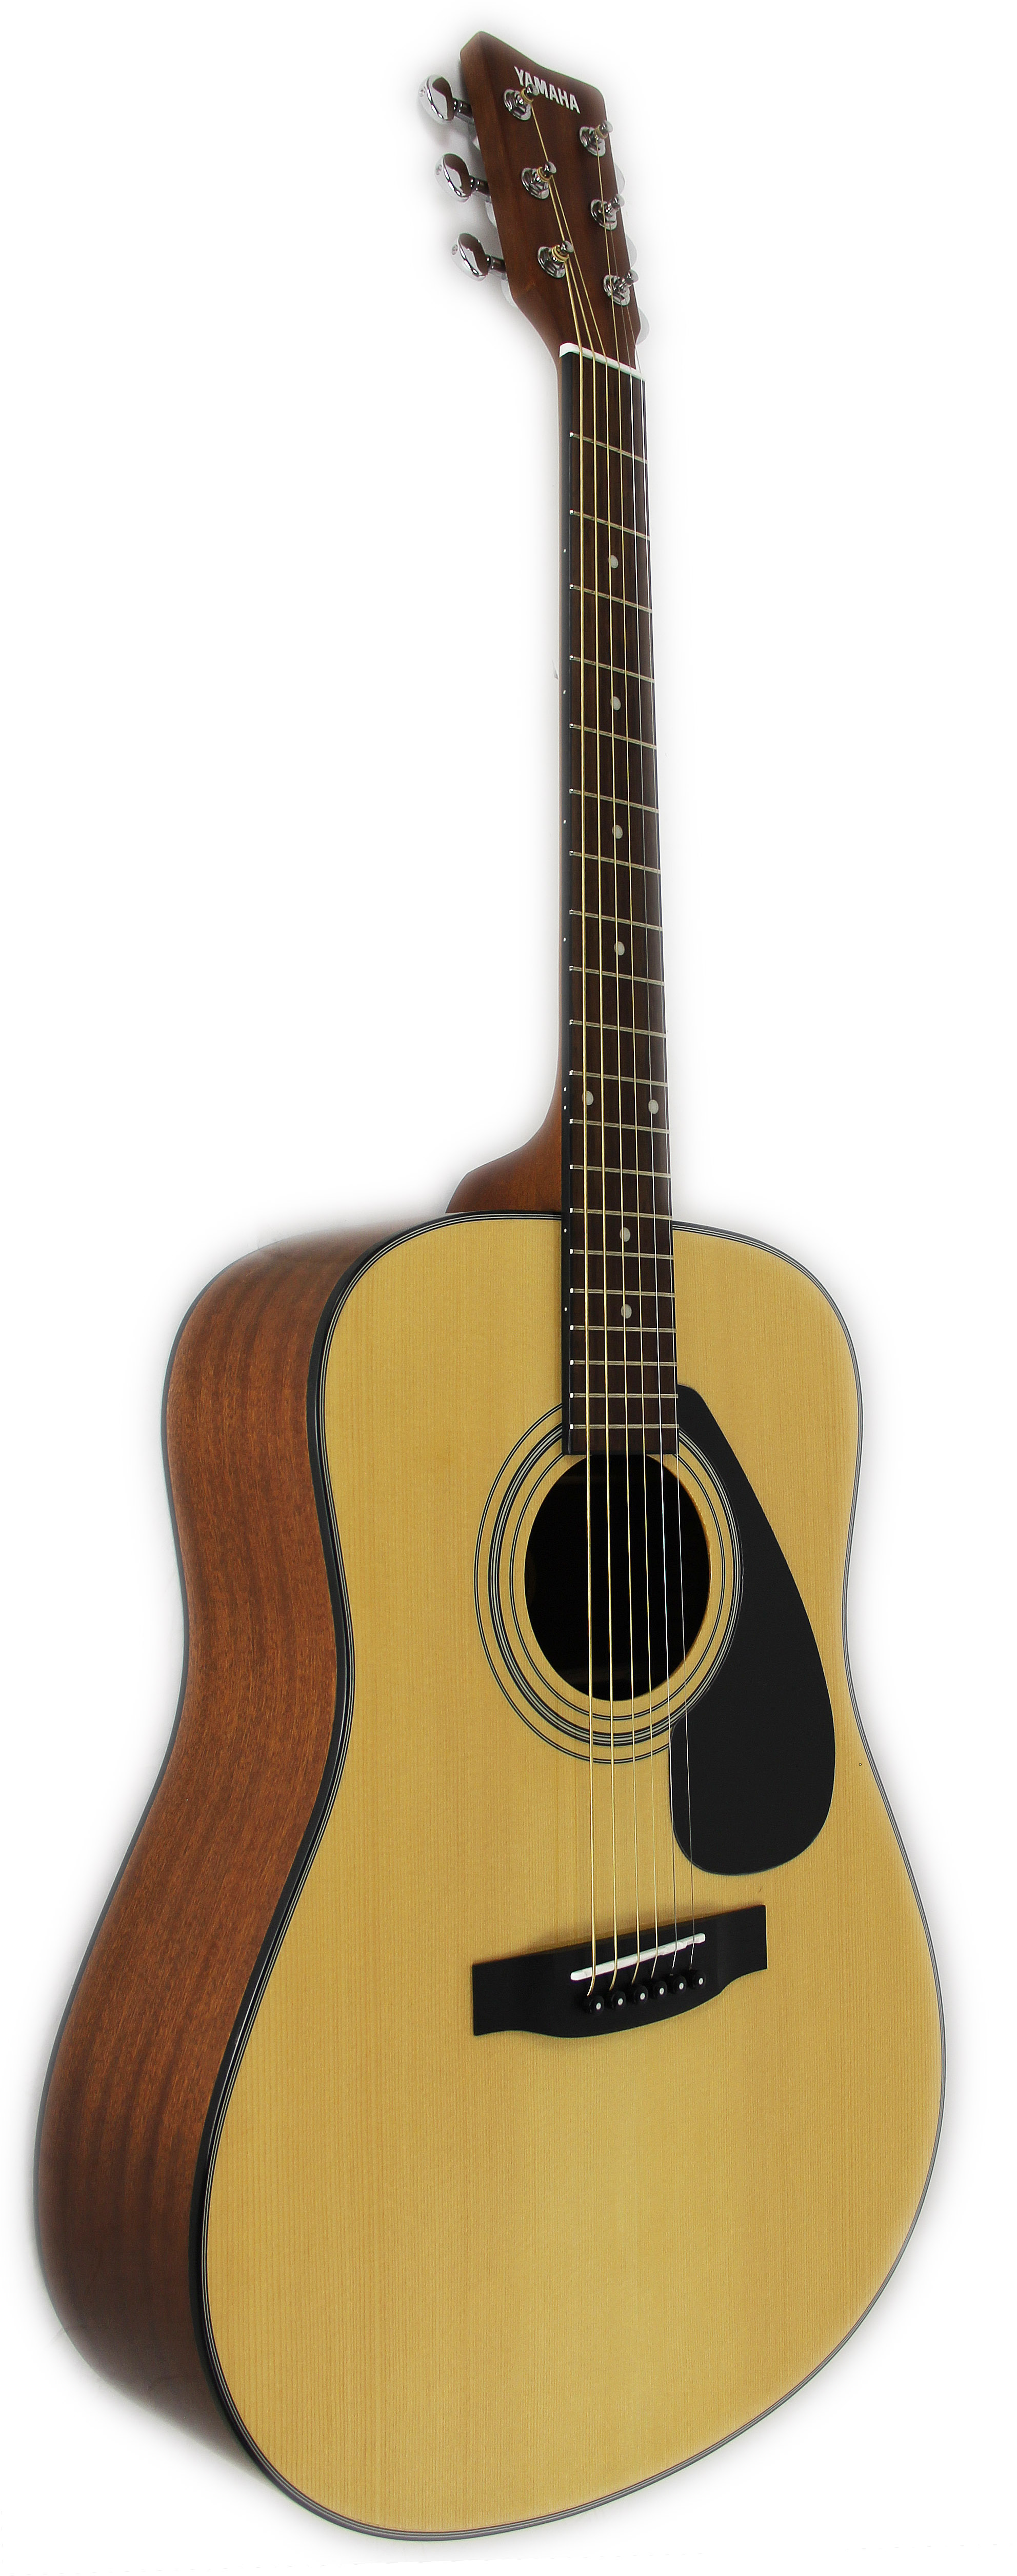 Yamaha f325d acoustic guitar w hard case ebay for Yamaha reface hard case